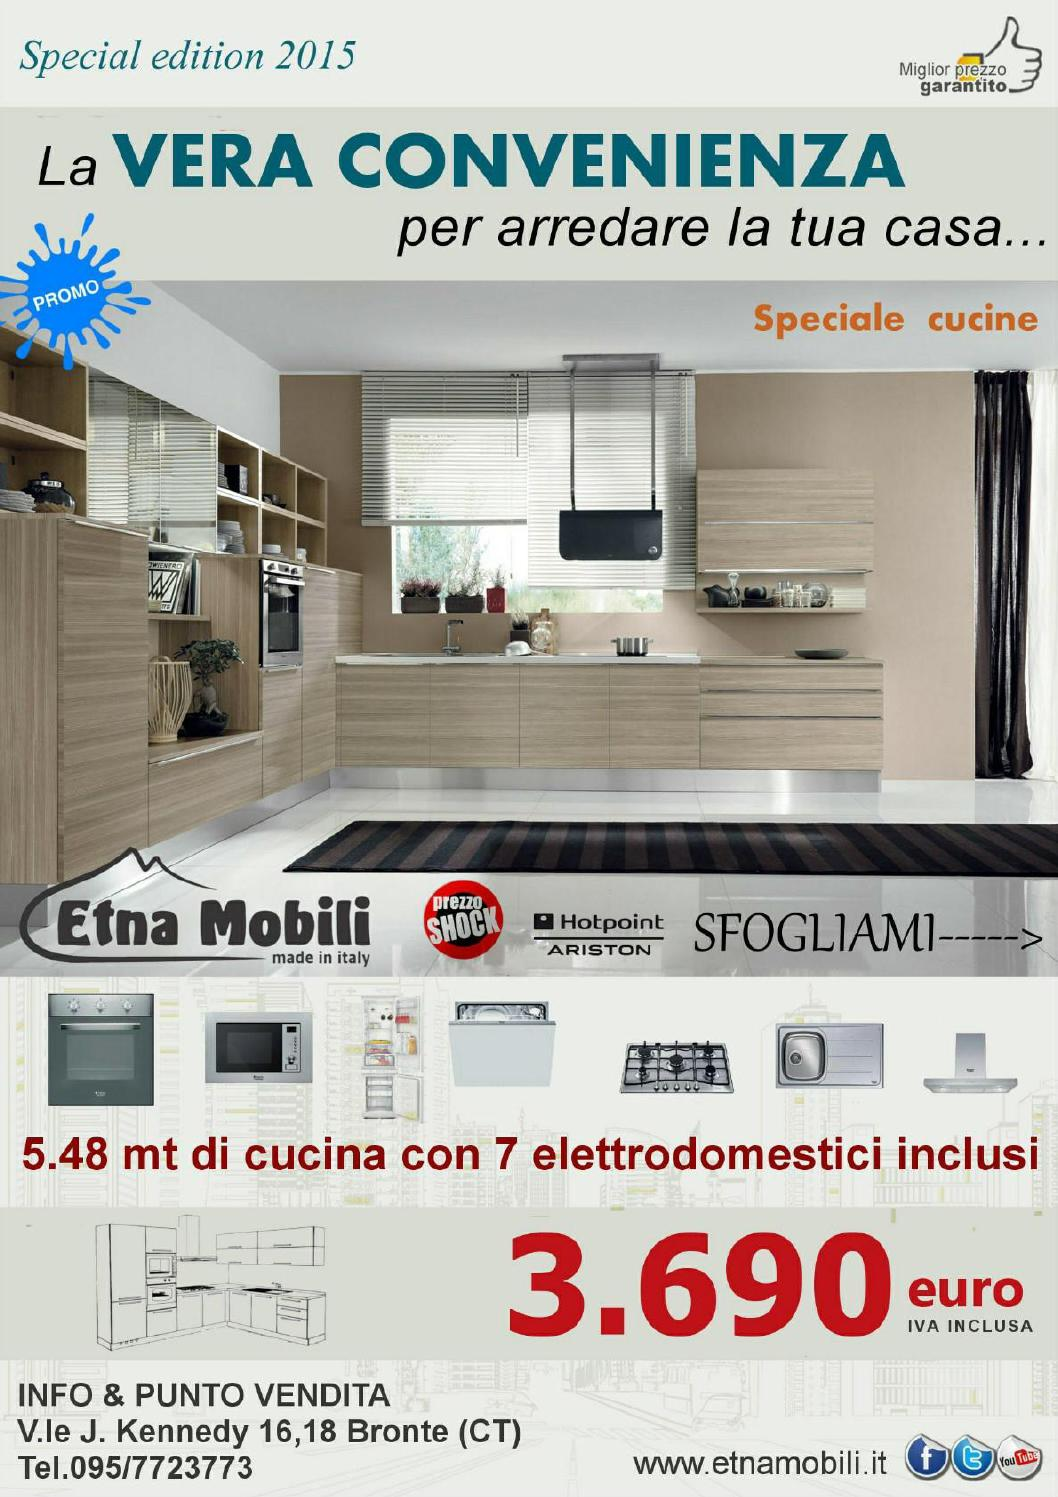 Issuu volantino brochure etna mobili 2014 2015 by etna - Offerte mobili catania ...